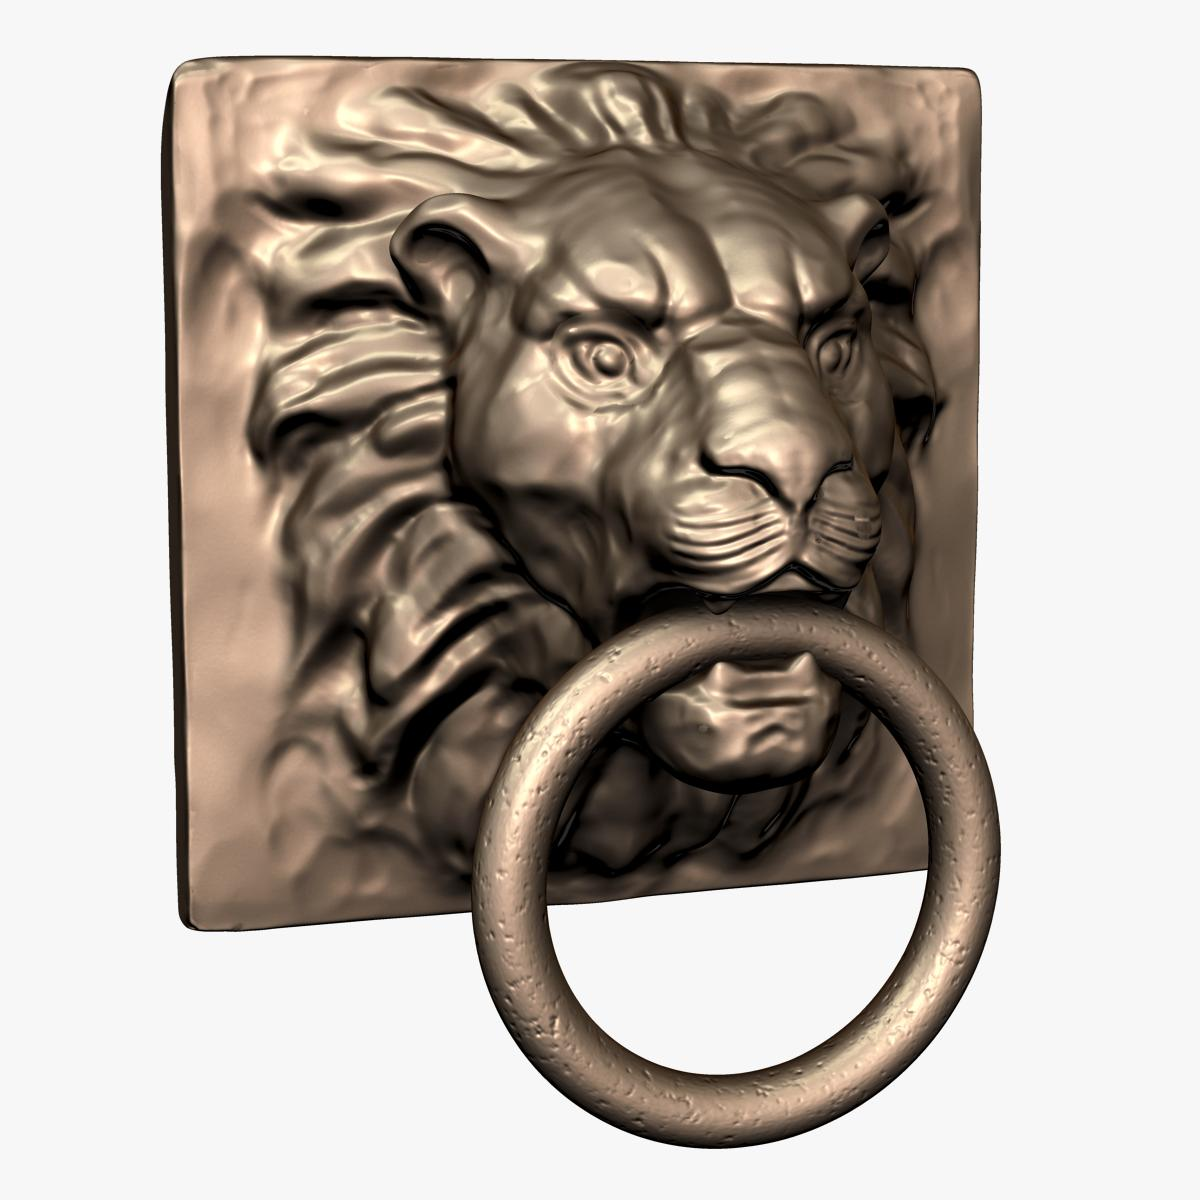 Bronze truong 39 s blog - Lion face door knocker ...